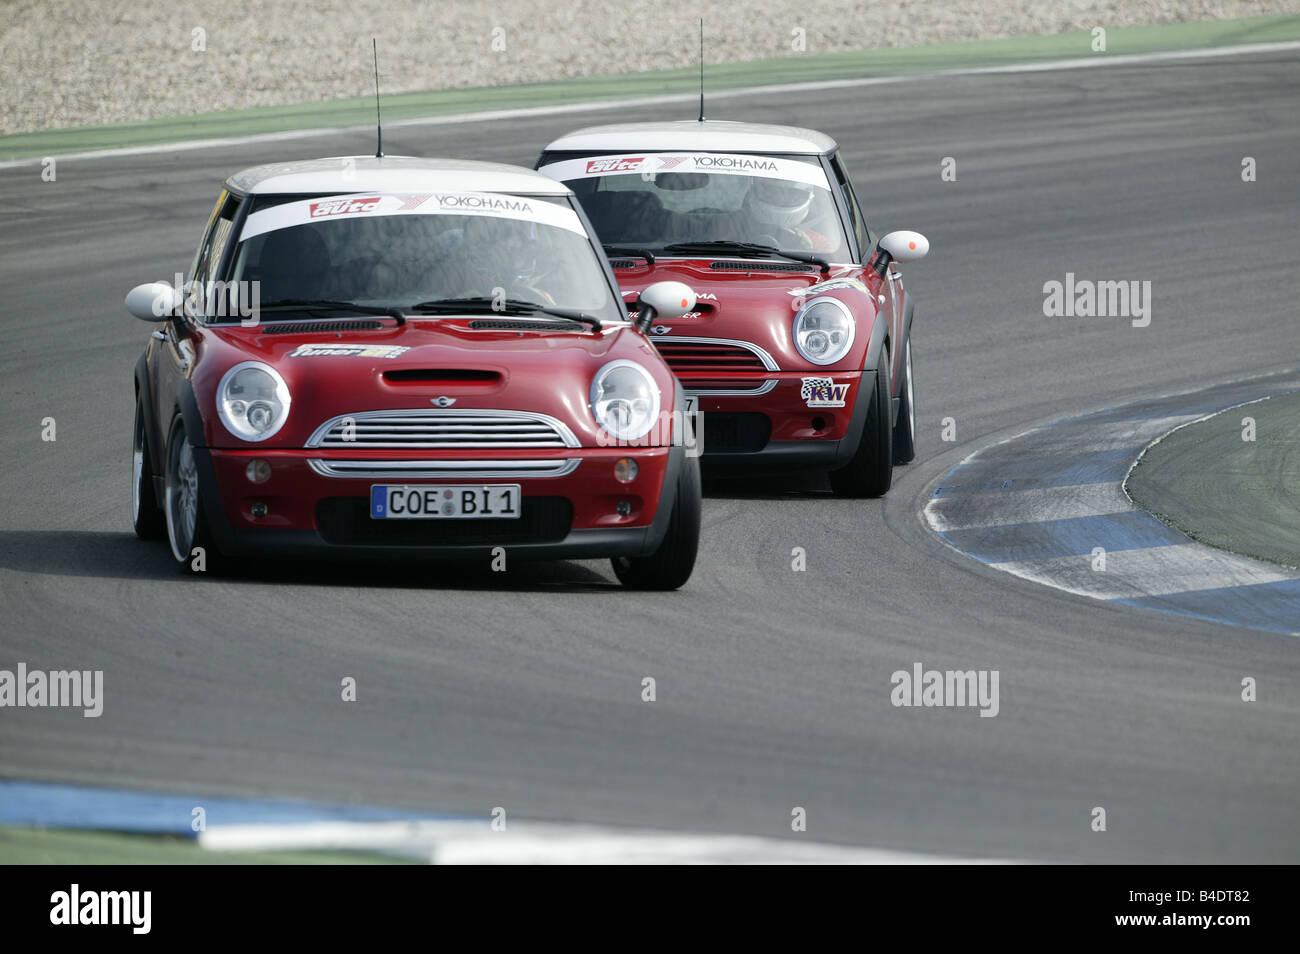 Tuner Grand Prix Stockfotos & Tuner Grand Prix Bilder - Alamy